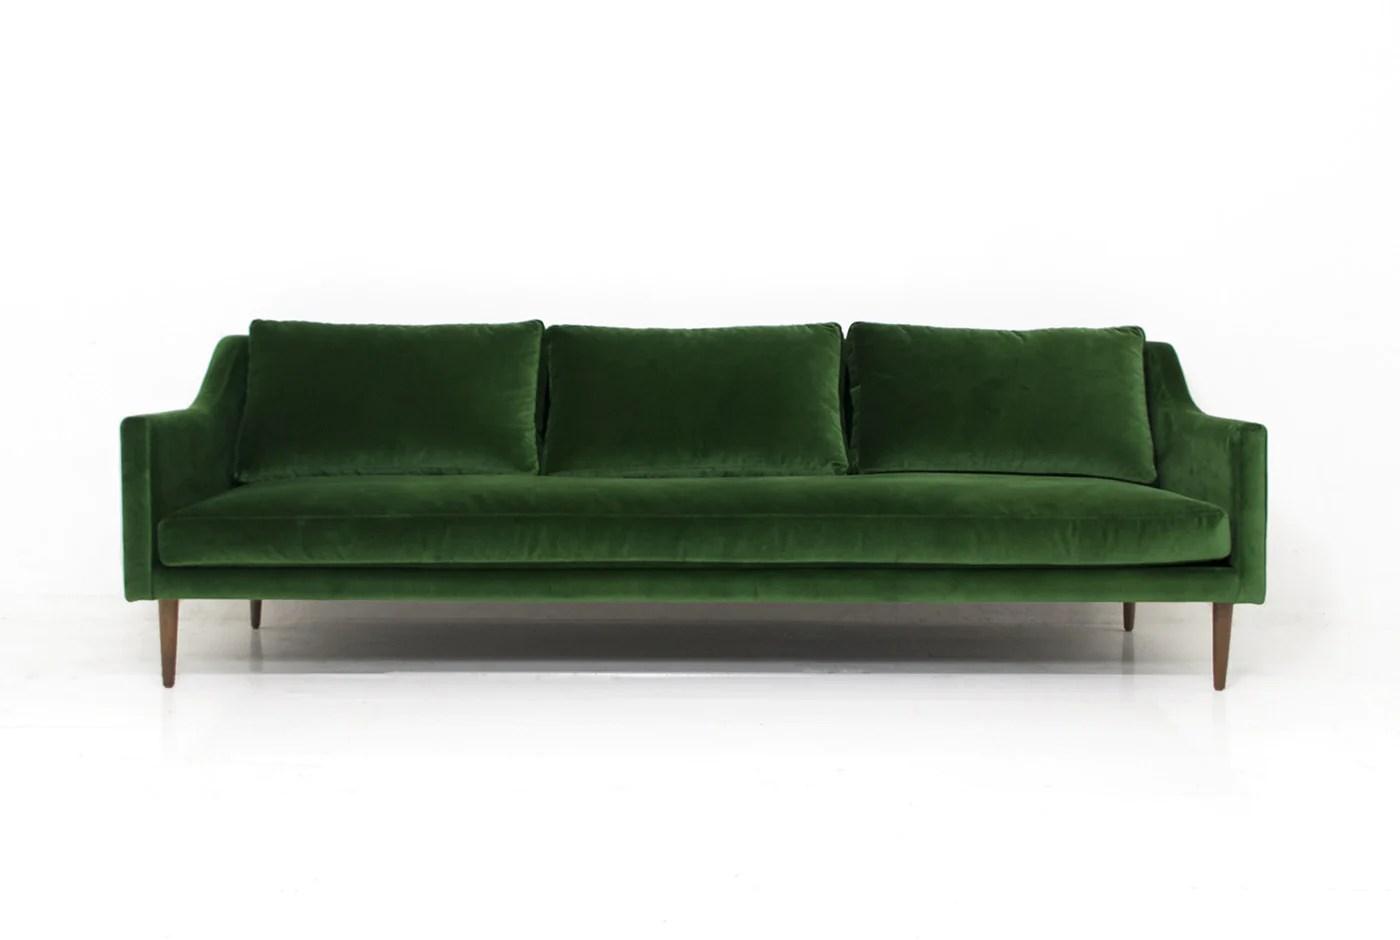 emerald green velvet sofa bed best sets for living room naples in modshop